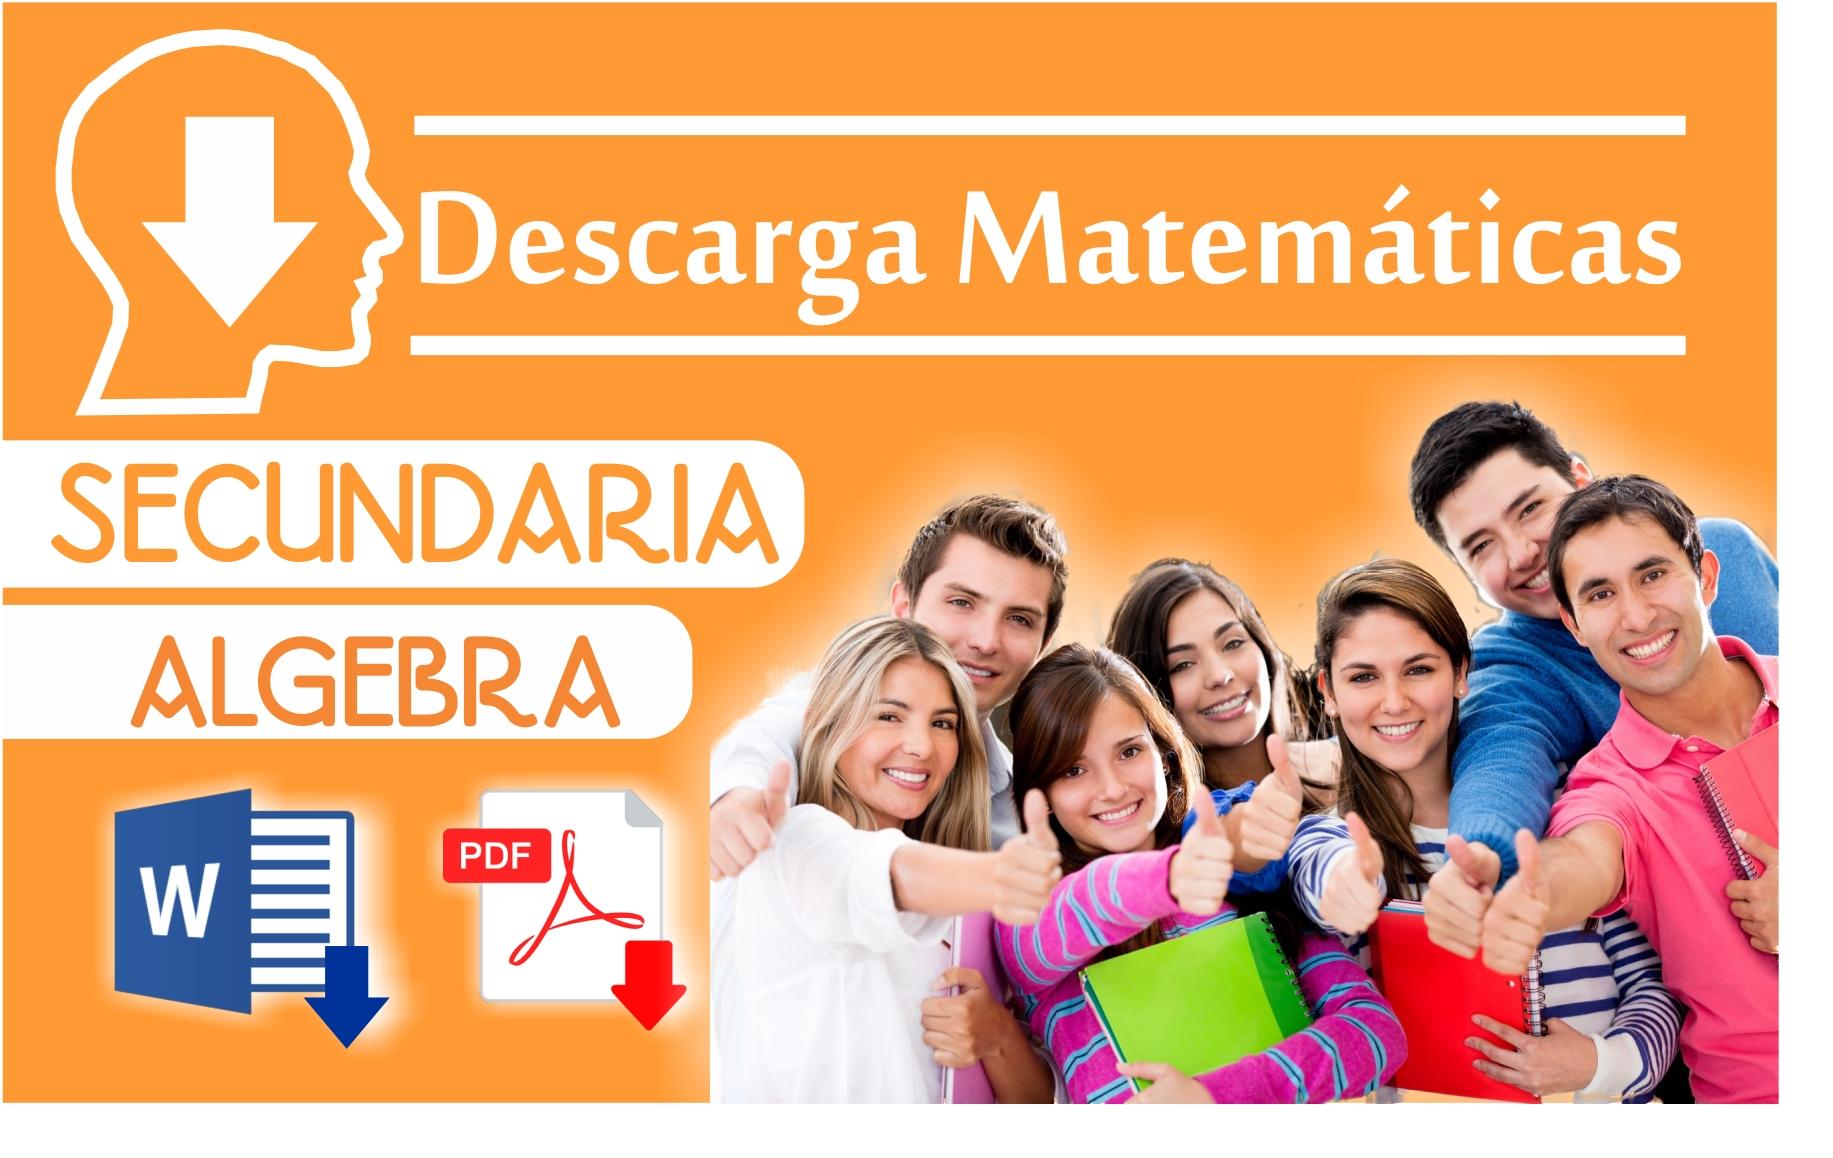 DESCARGA MATEMATICAS - SECUNDARIA - ALGEBRA